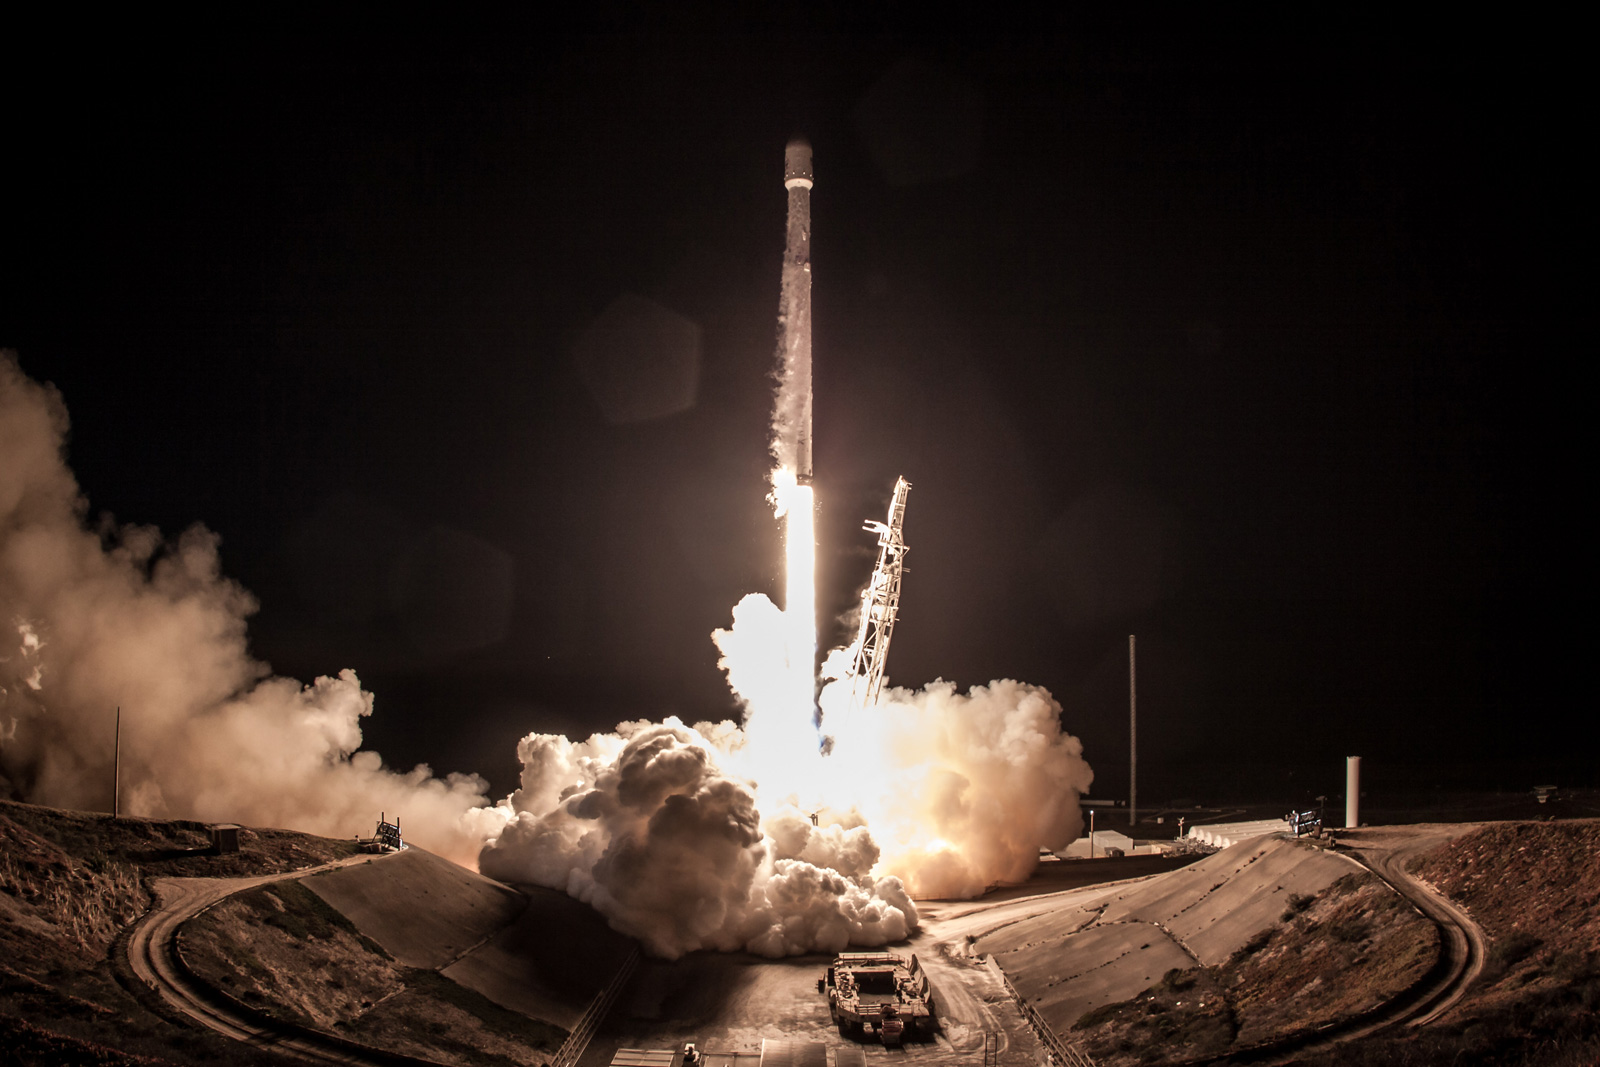 spacex-falcon-9-iridium-4-flickr.jpg